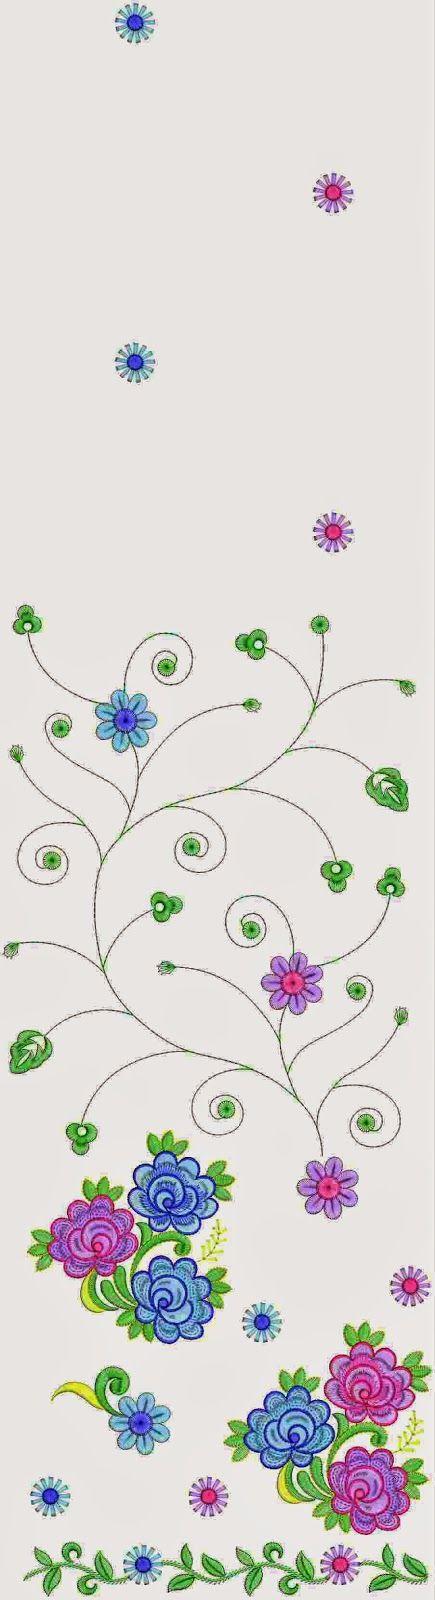 Hand Embroidered Norway Fashion Multi Sari Designs - Embdesigntube